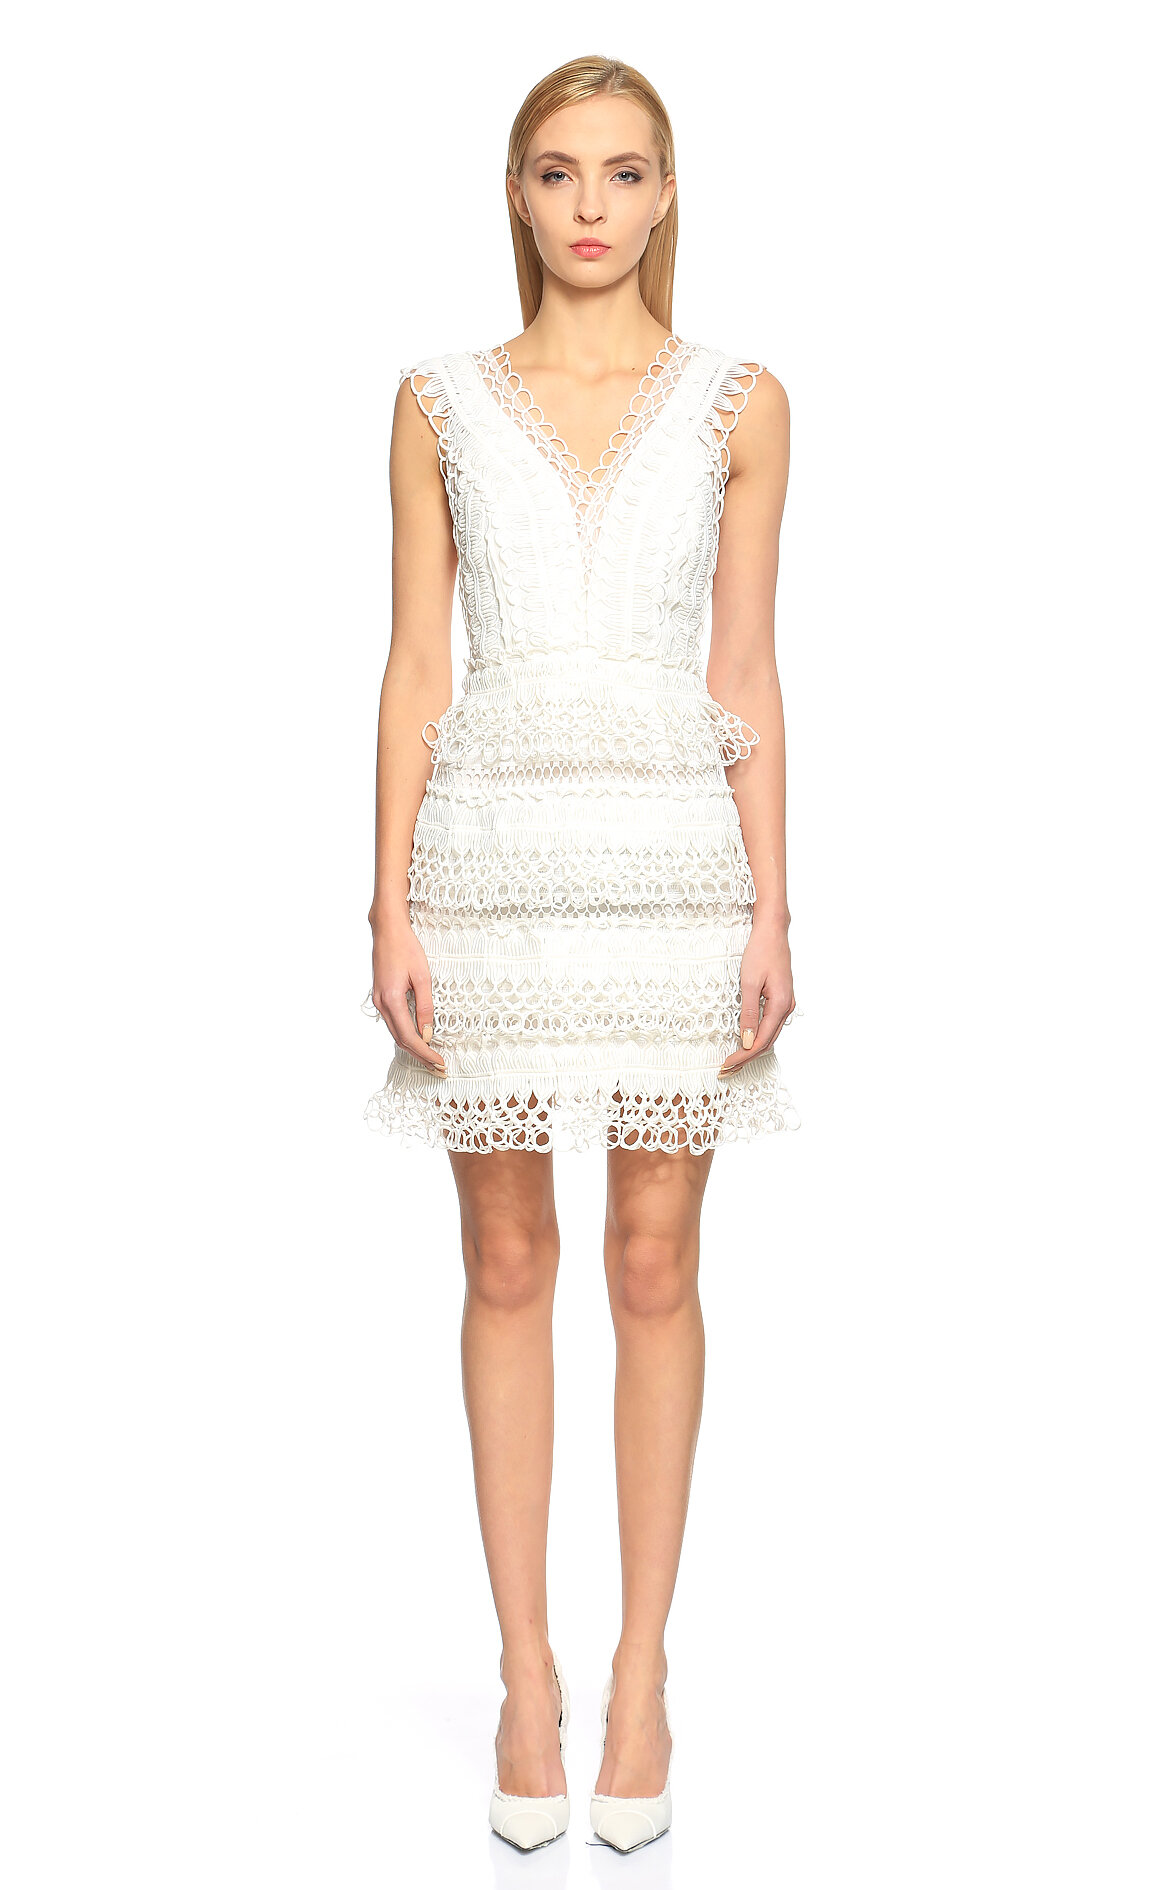 Thurley-Thurley İşleme Detaylı Mini Elbise